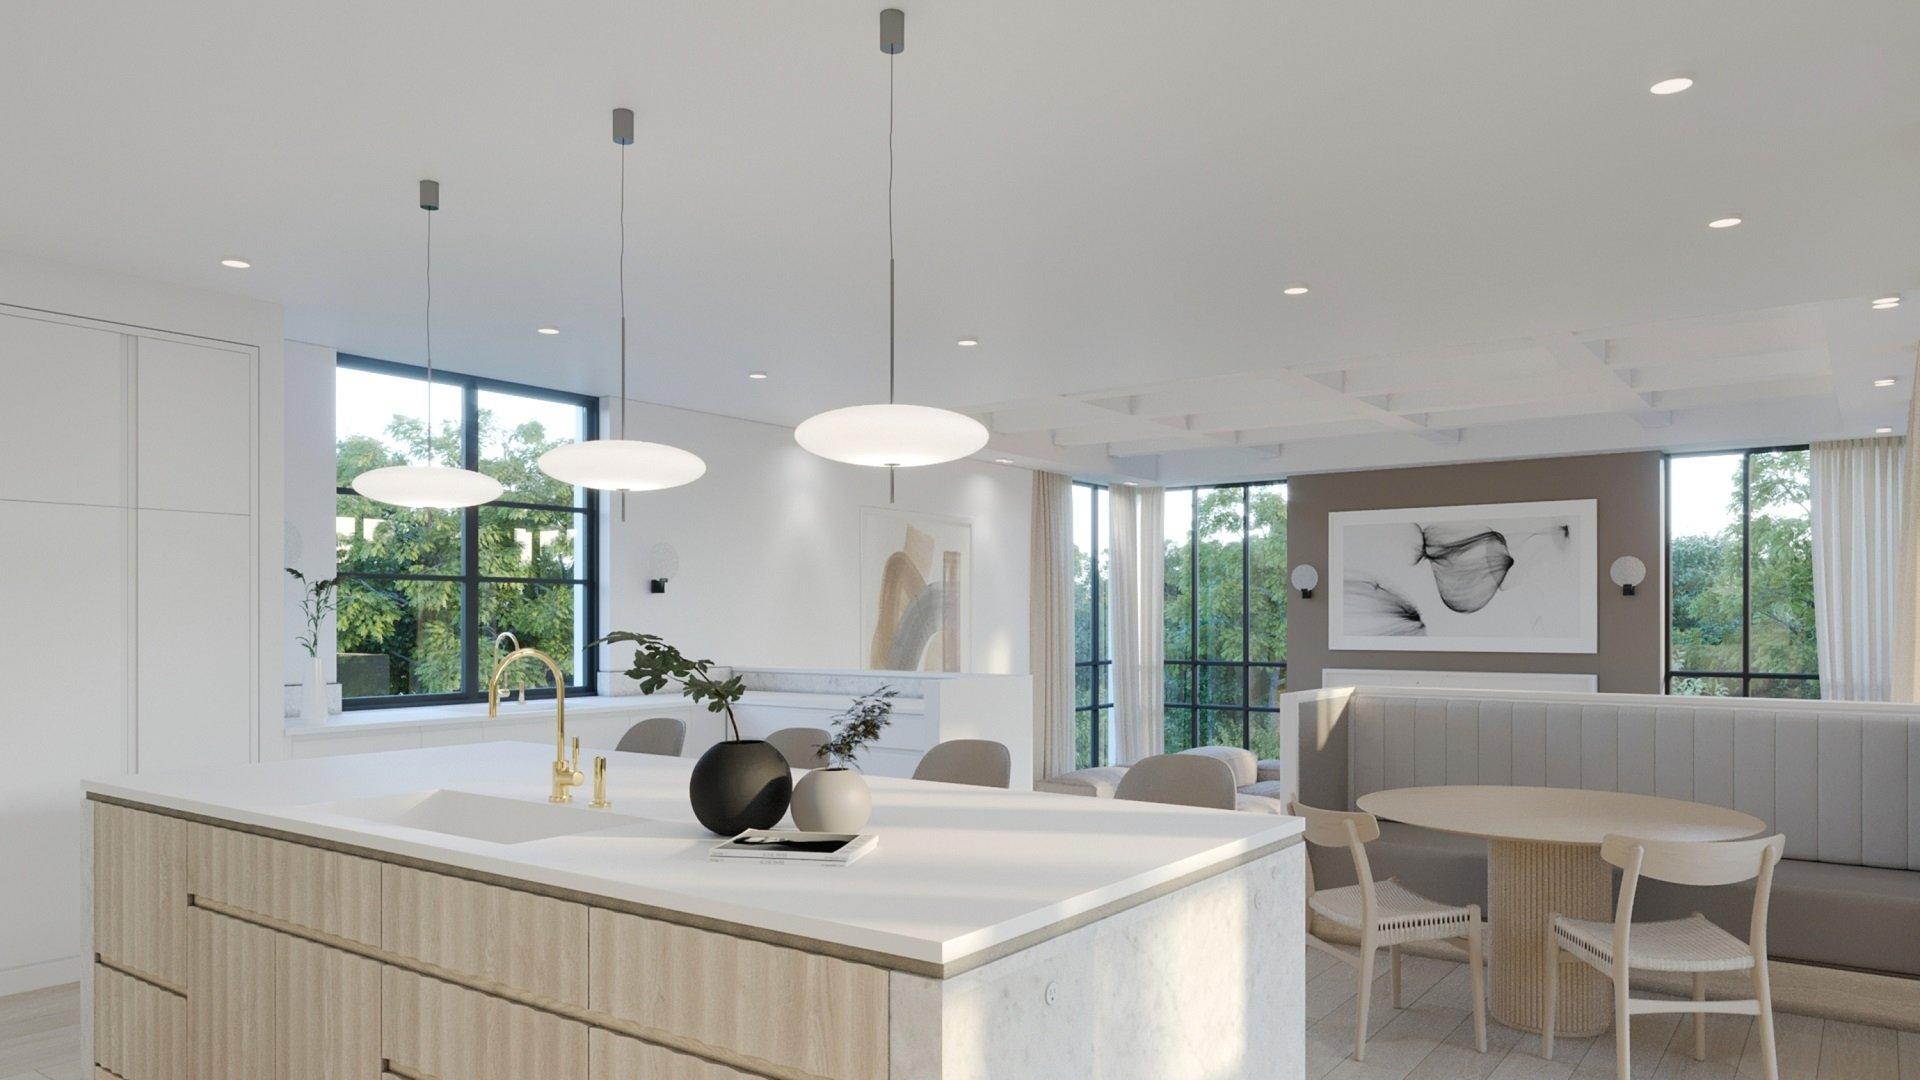 3d, 3dvisualization, 3drendering, interior, interiorconcept, interiordesign, interiorrendering, photorealistic